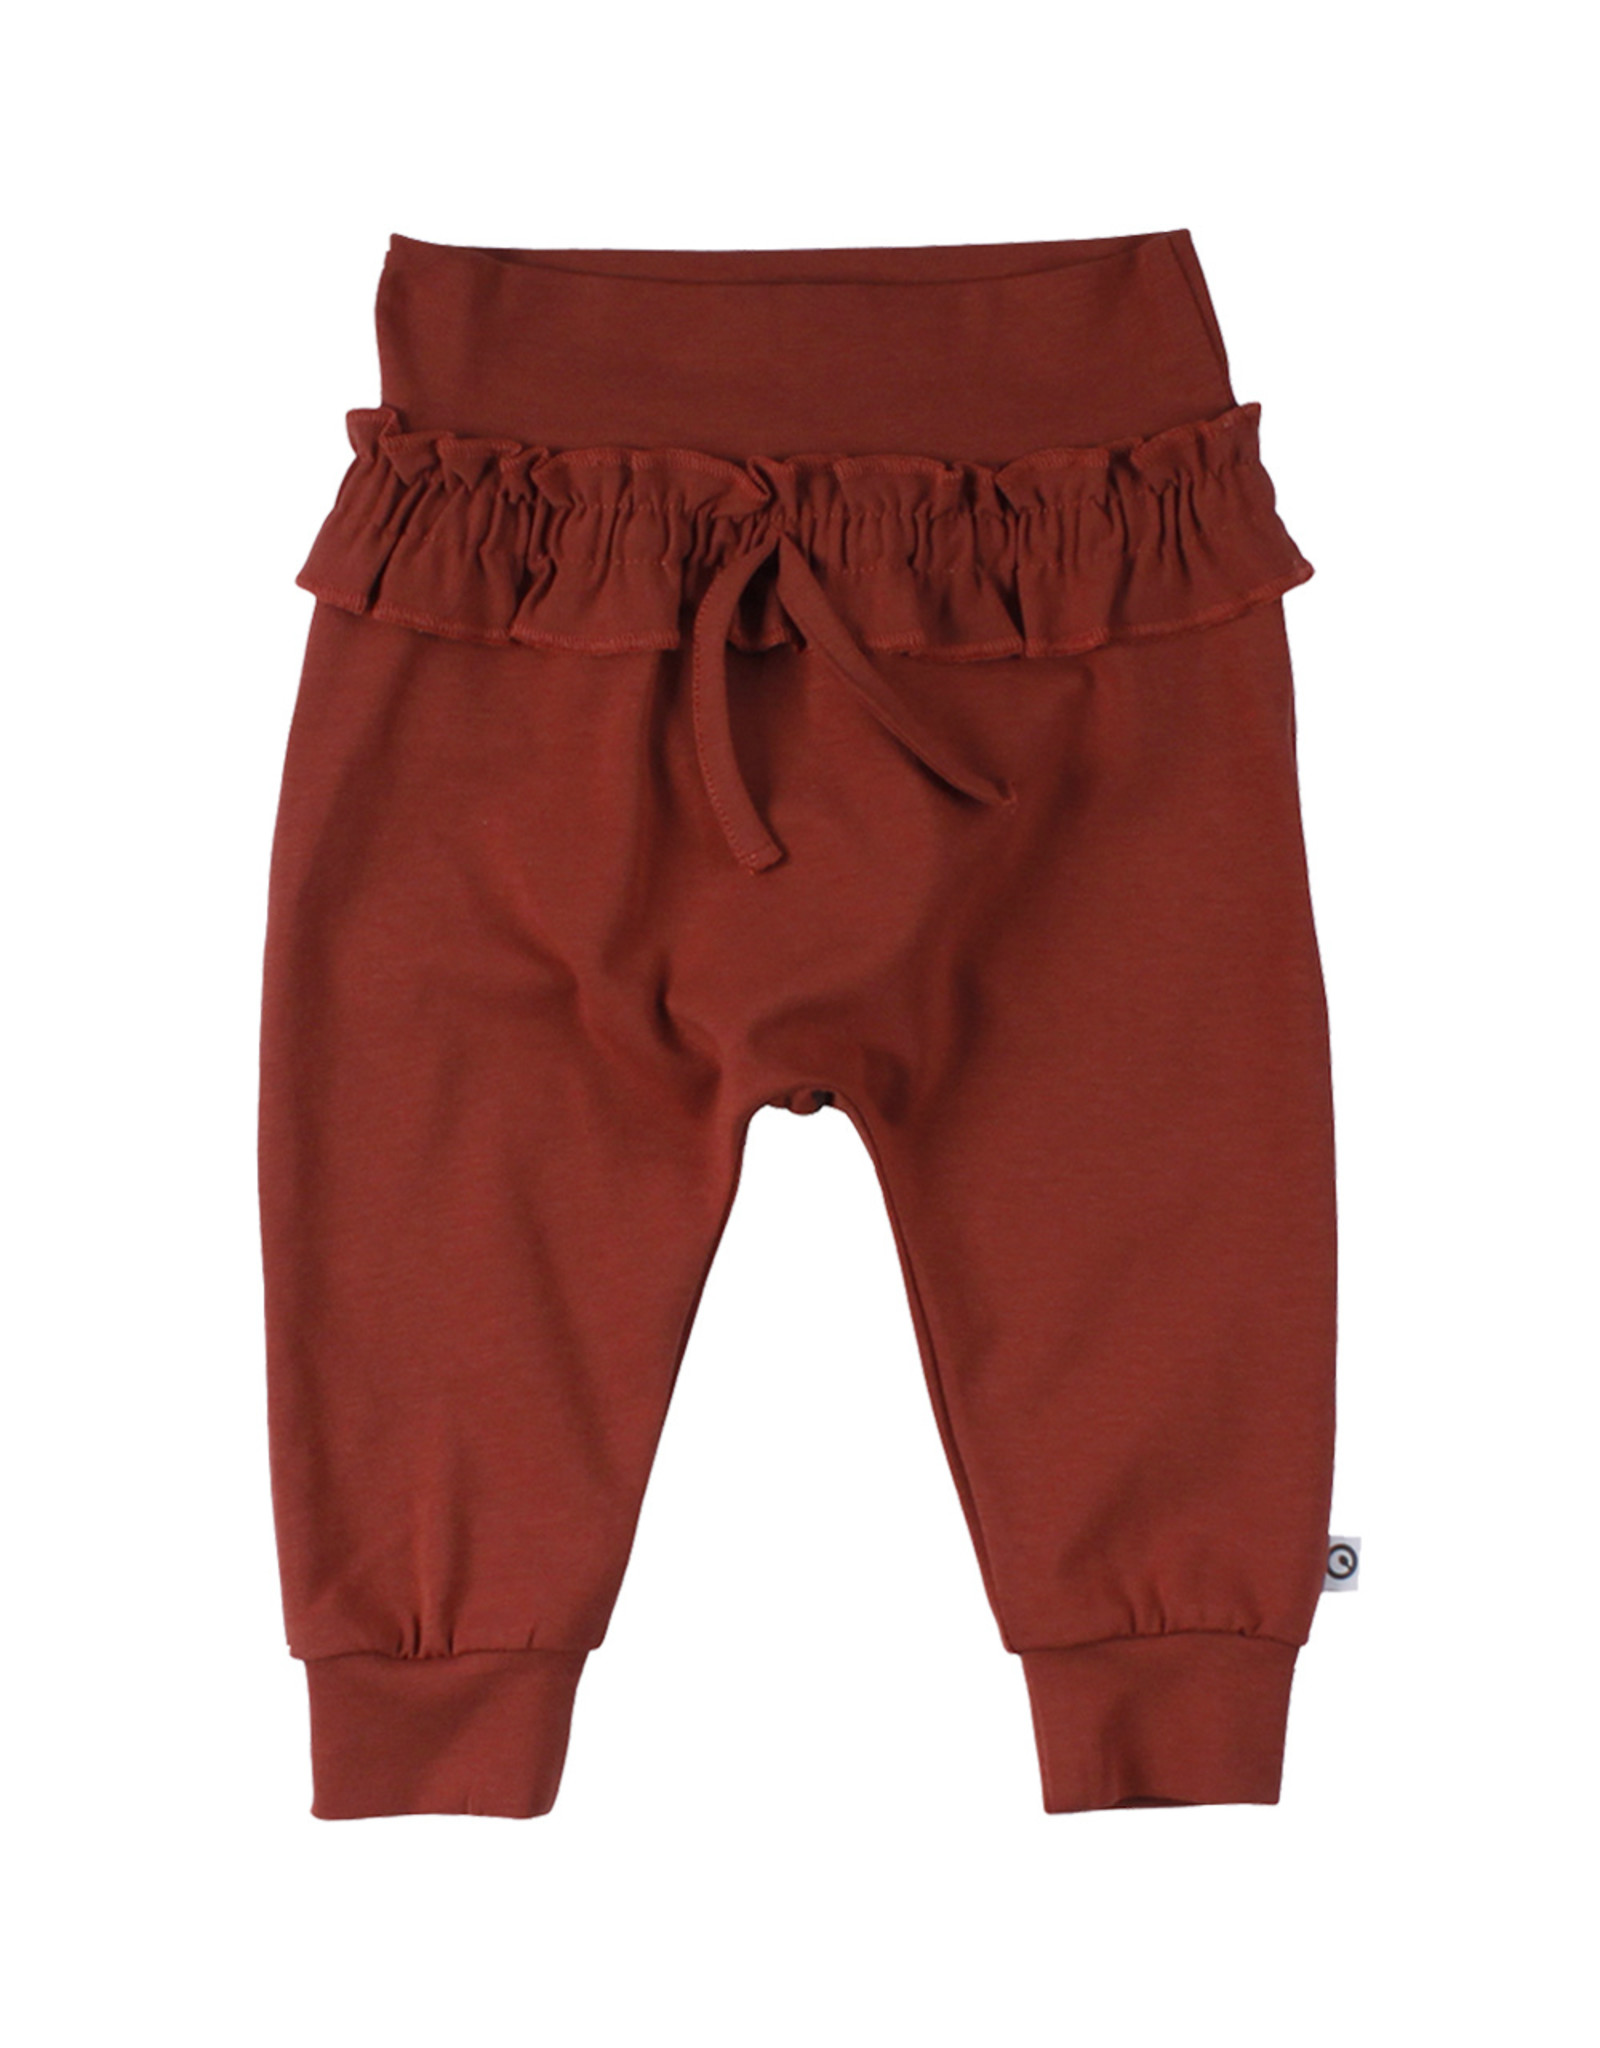 Müsli Müsli - Cozy me string pants - Russet